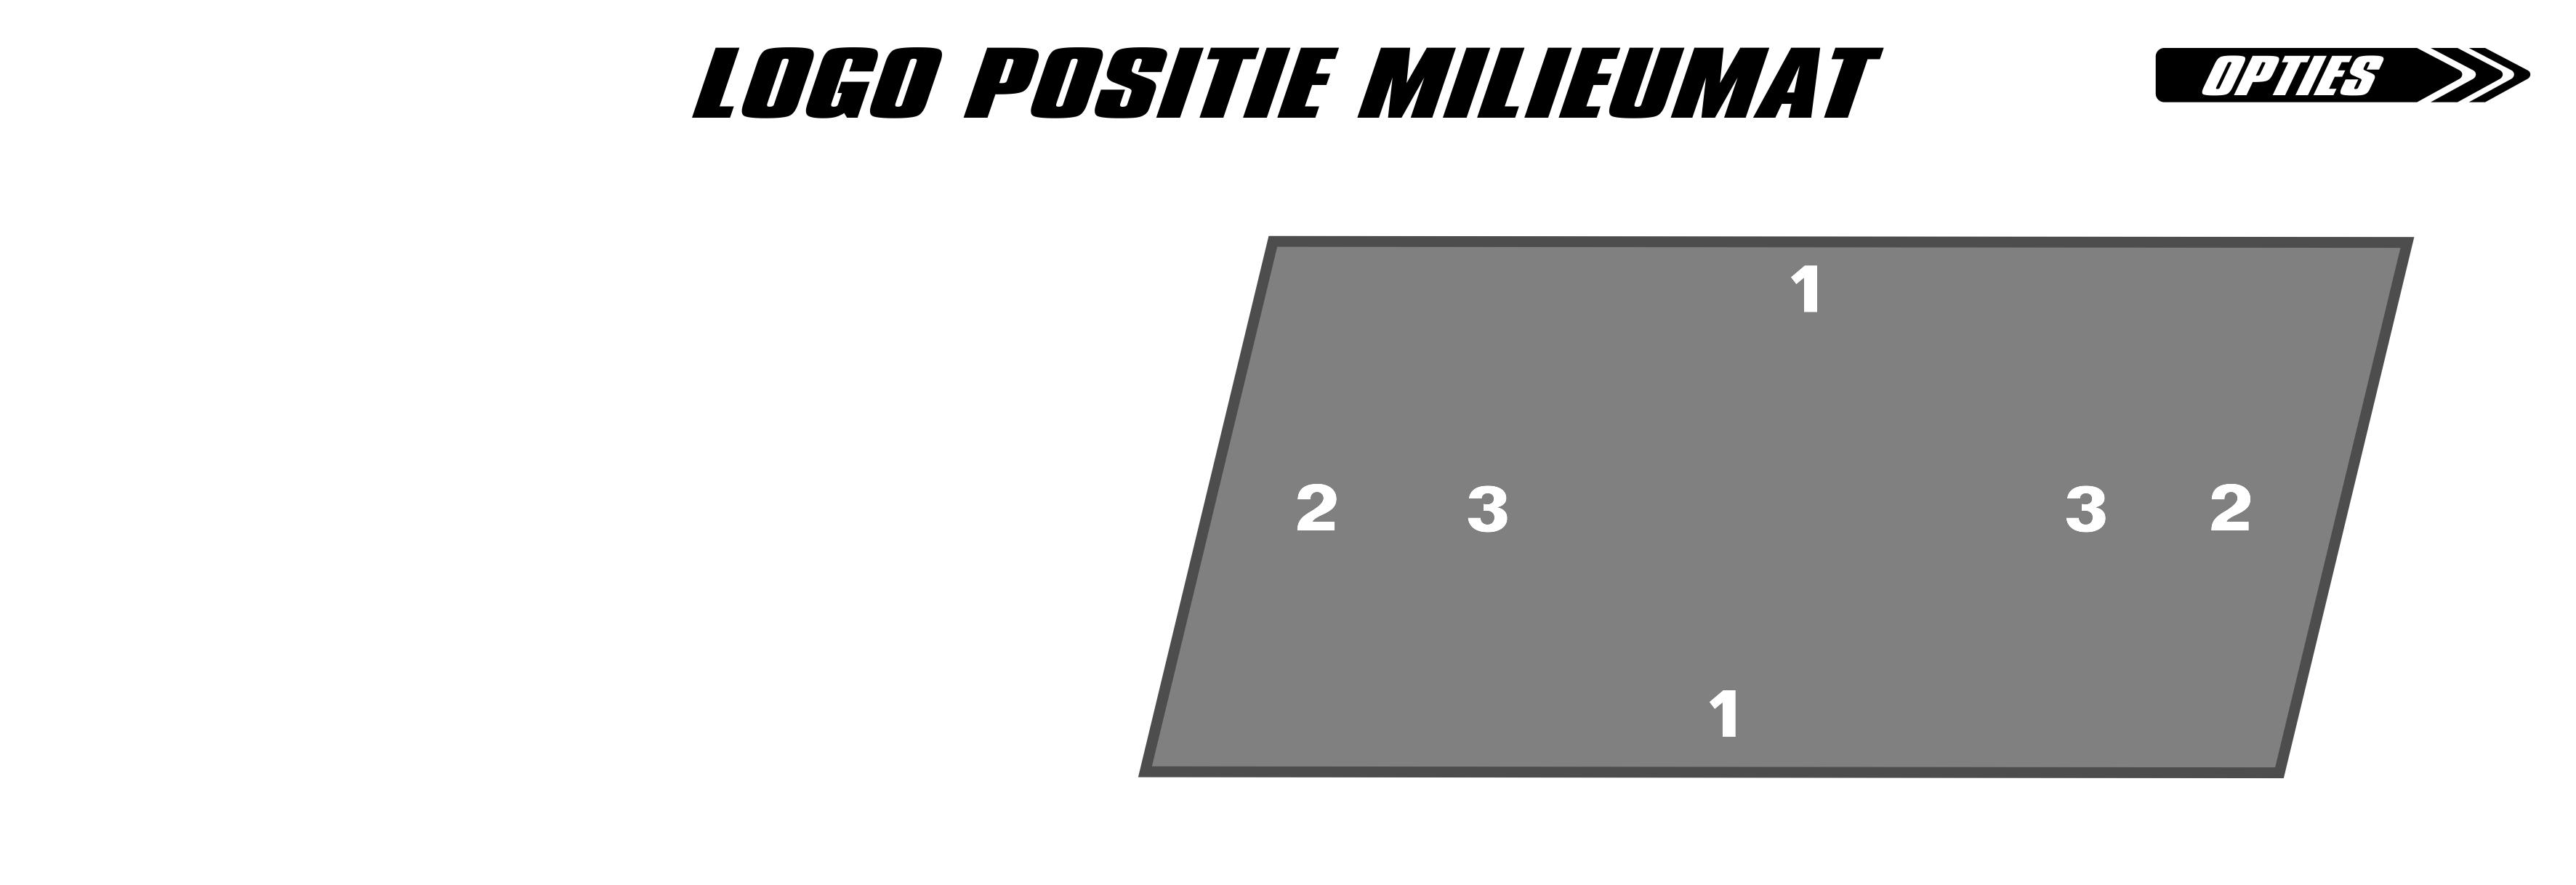 logo_positie_milieumat